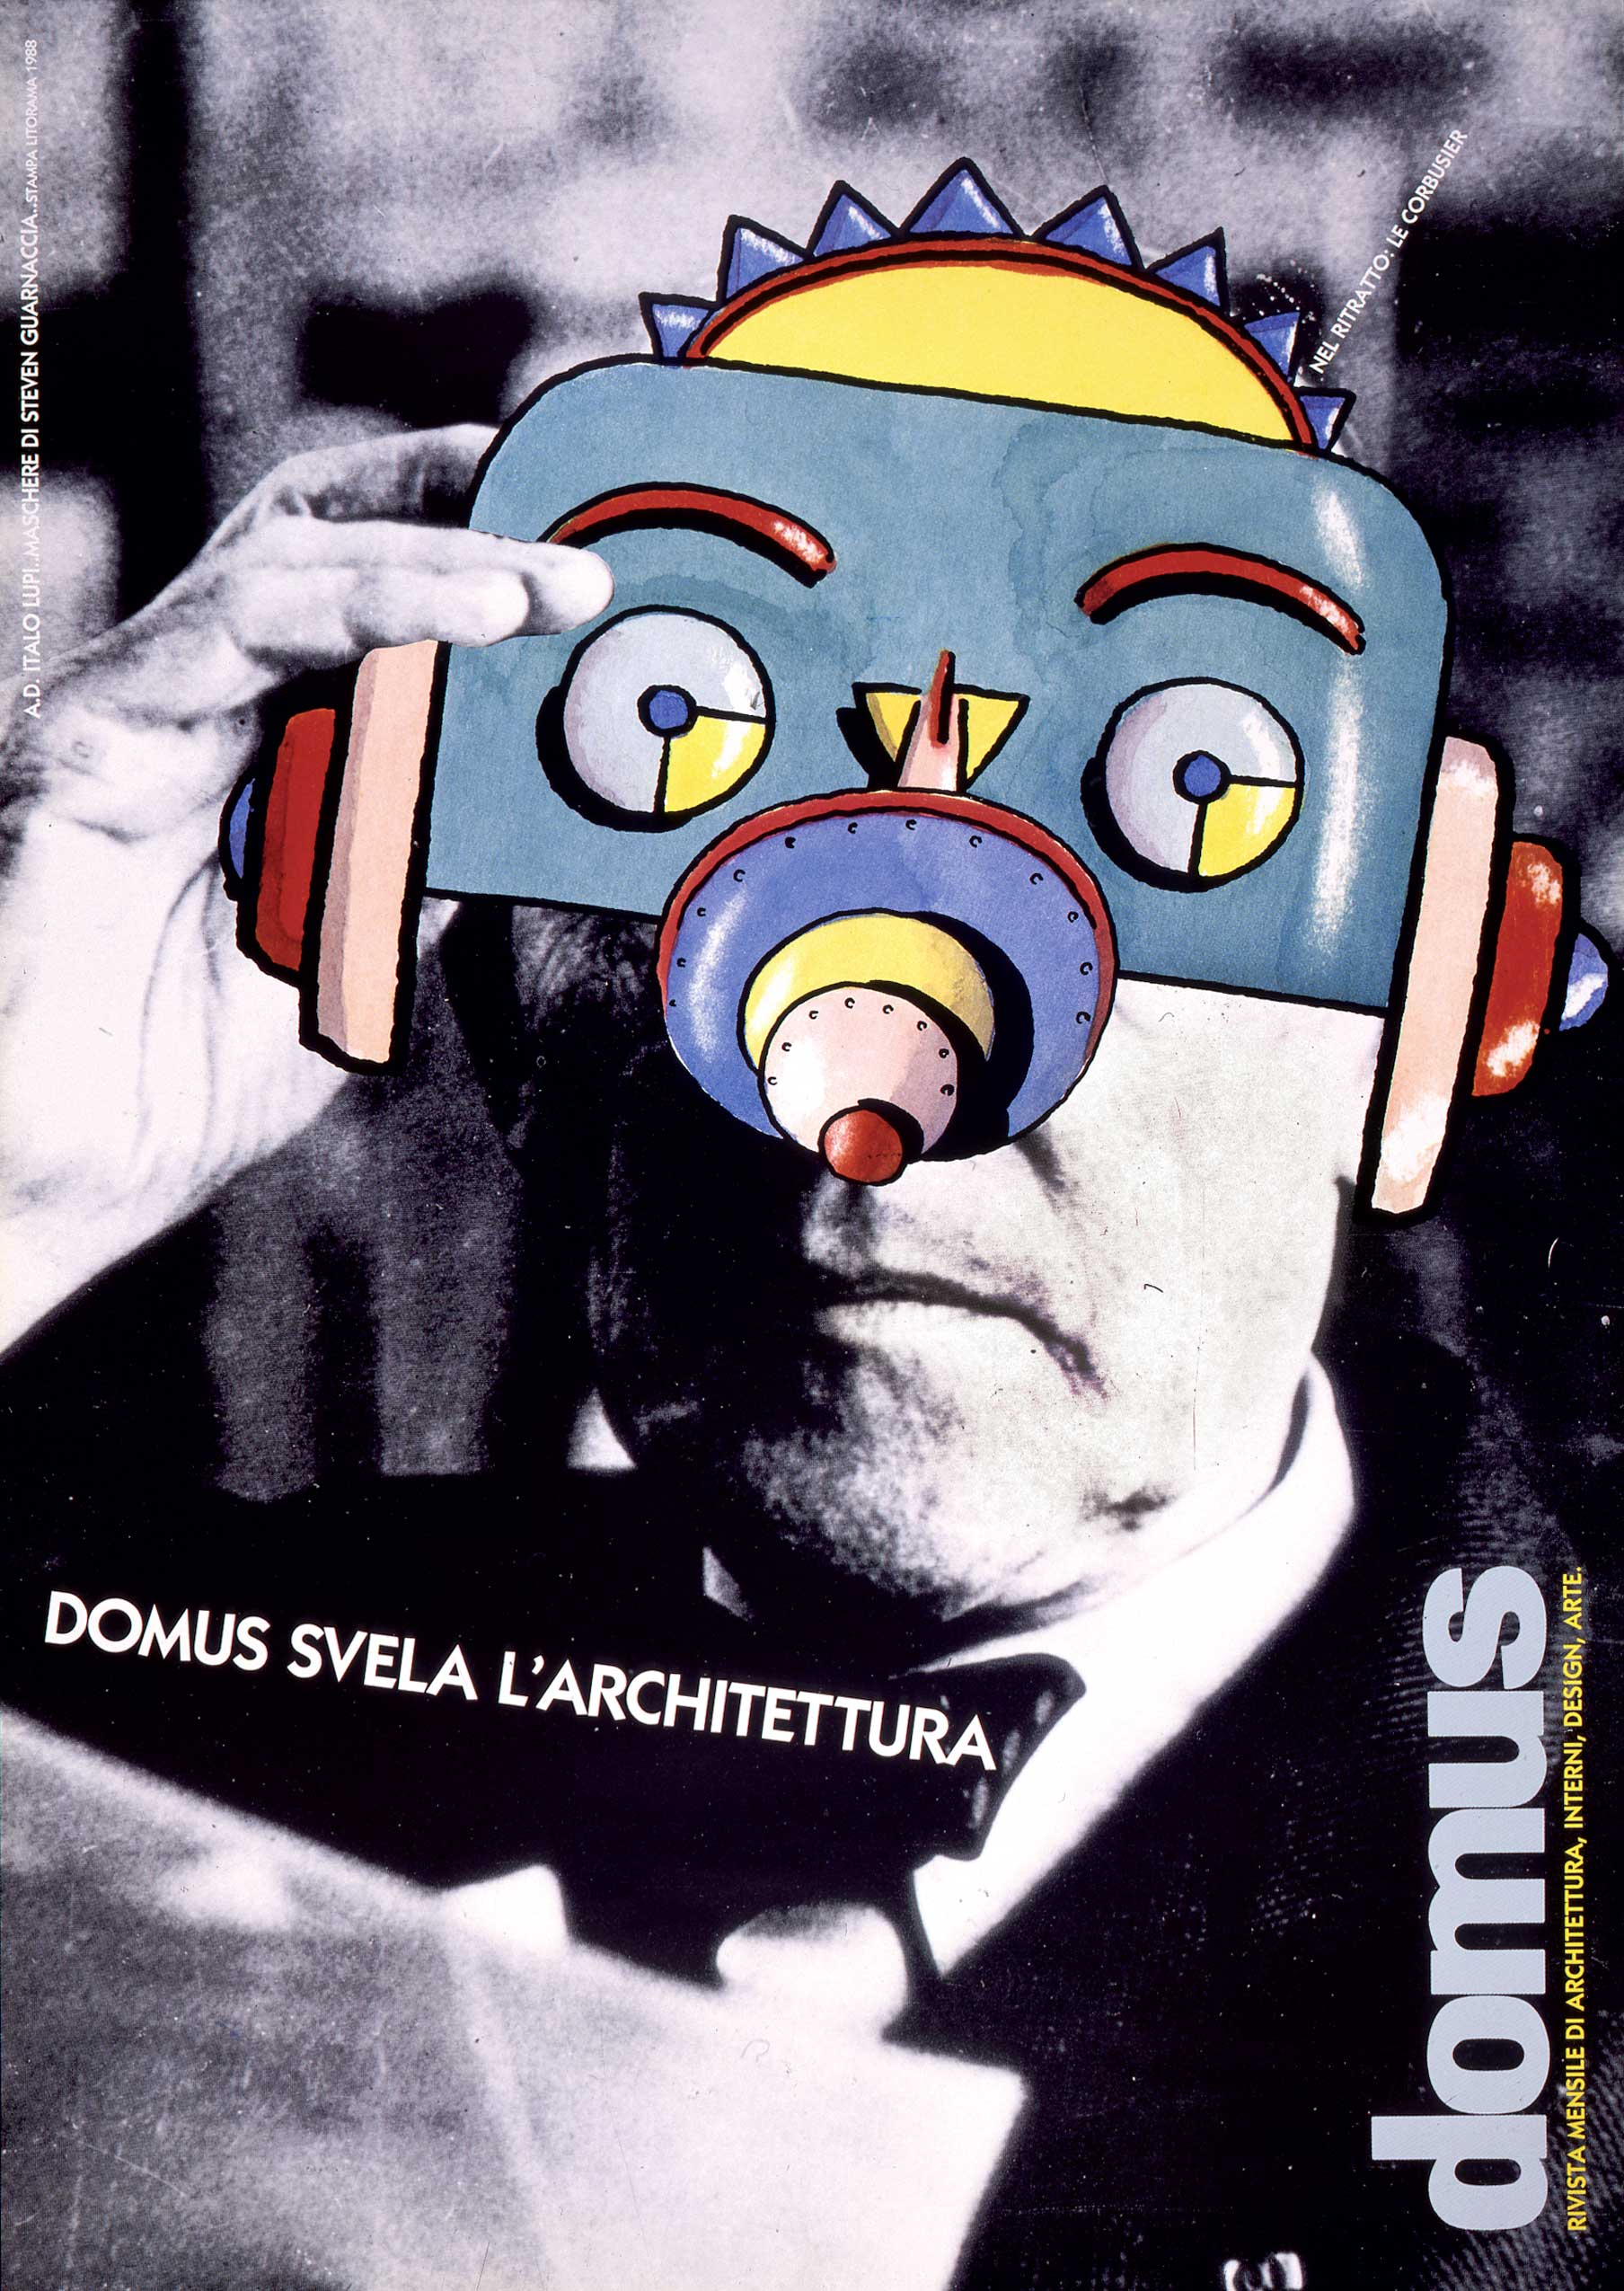 Manifesto Steven Guarnaccia Italo Lupi